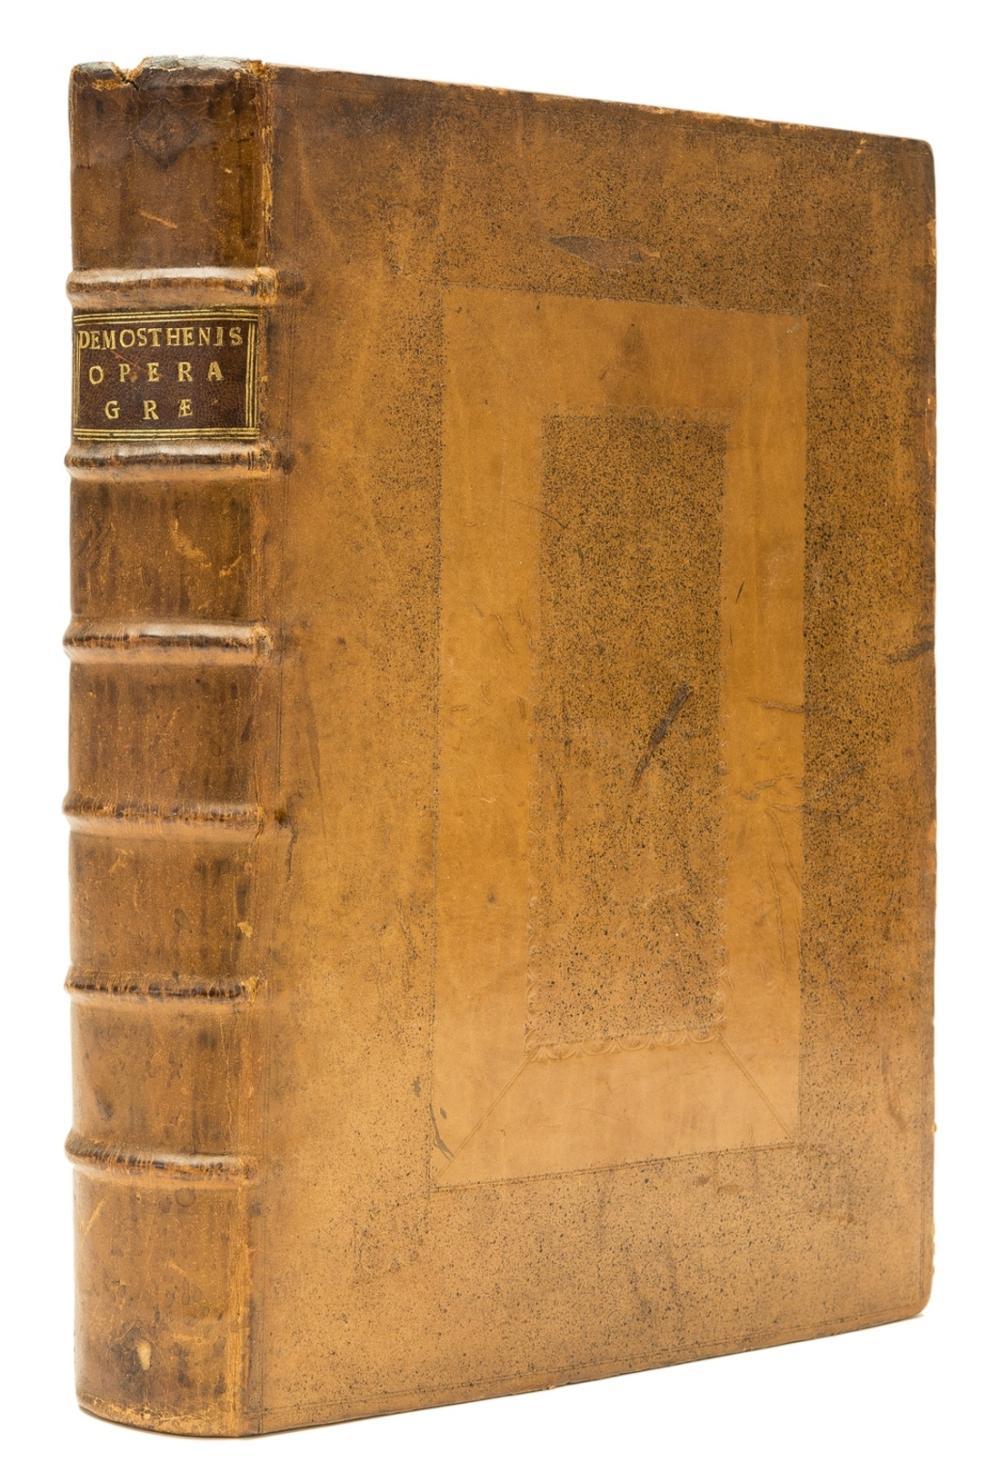 Demosthenes. Orationes duas & sexaginta [graece], Basel, Johannes Herwagen, 1532.